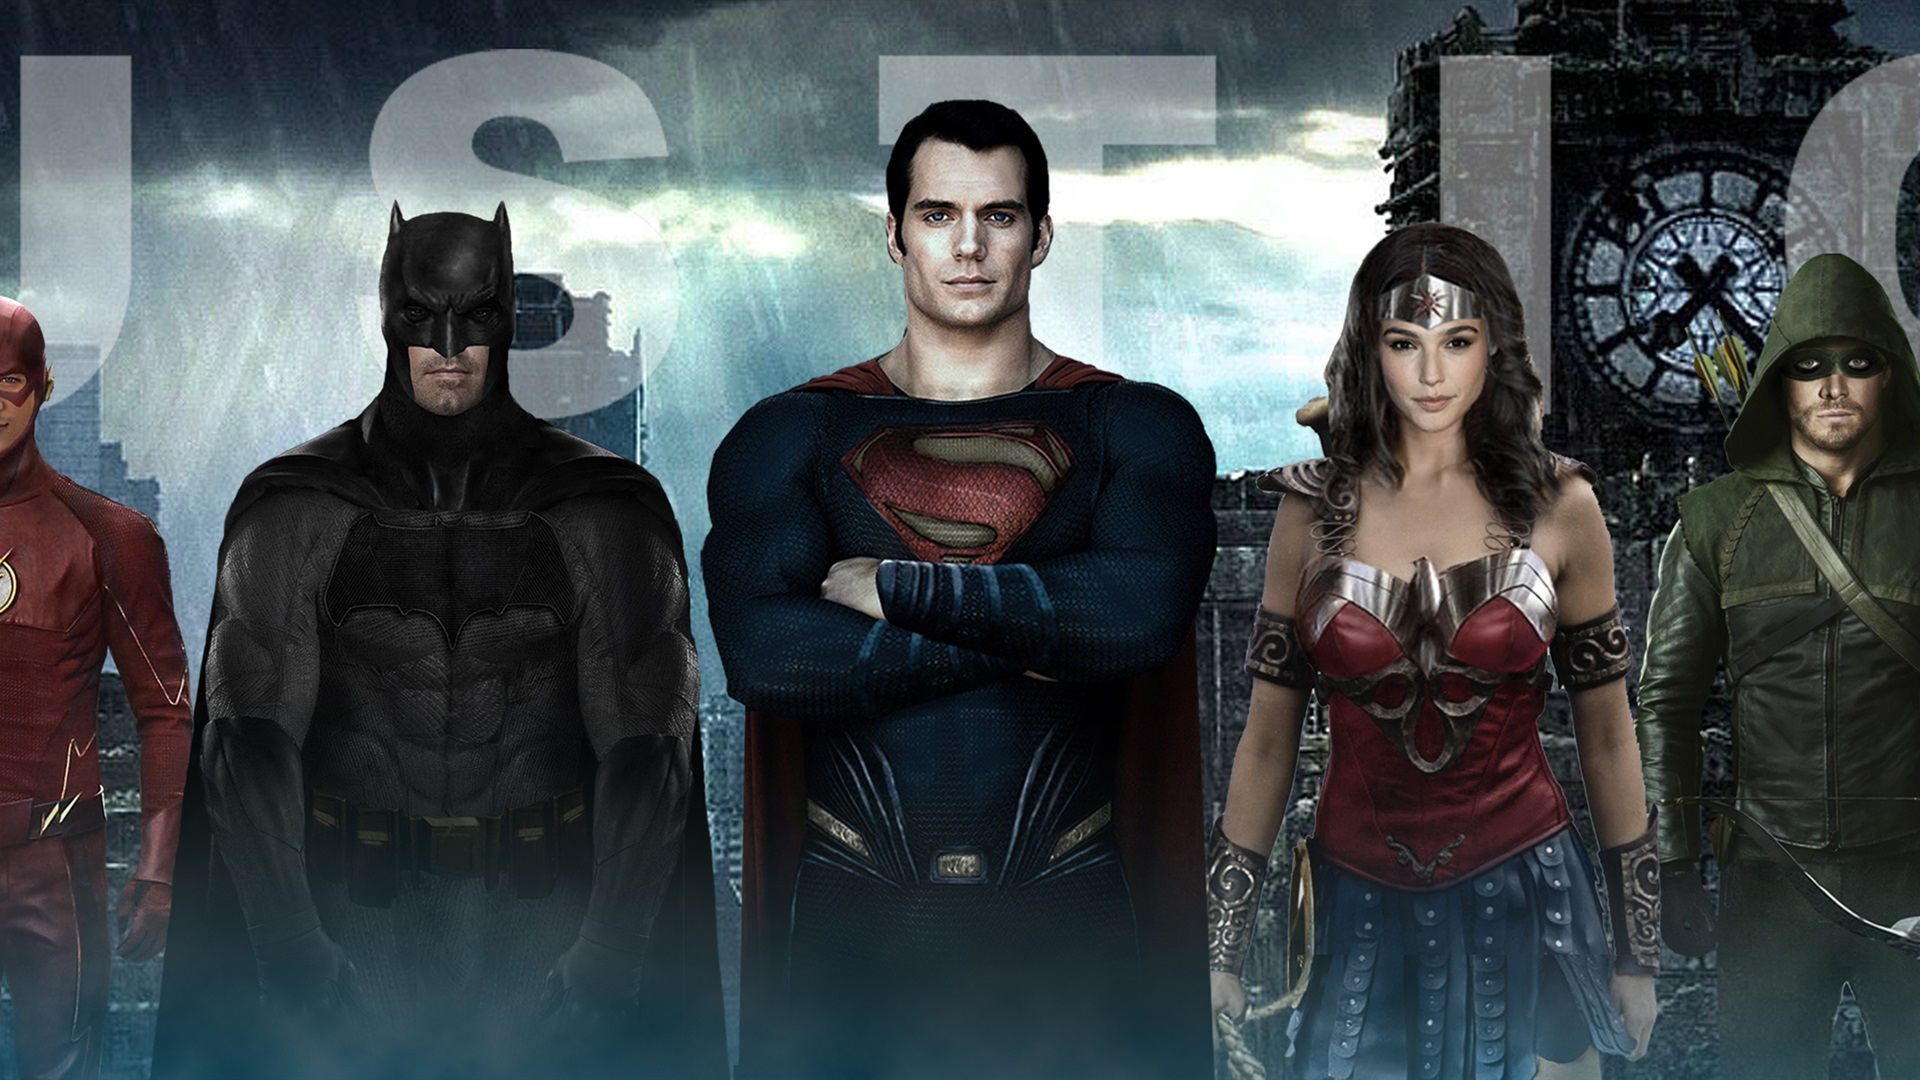 Wallpaper Justice League 2017 HD 3840x1200 Multi Monitor Panorama